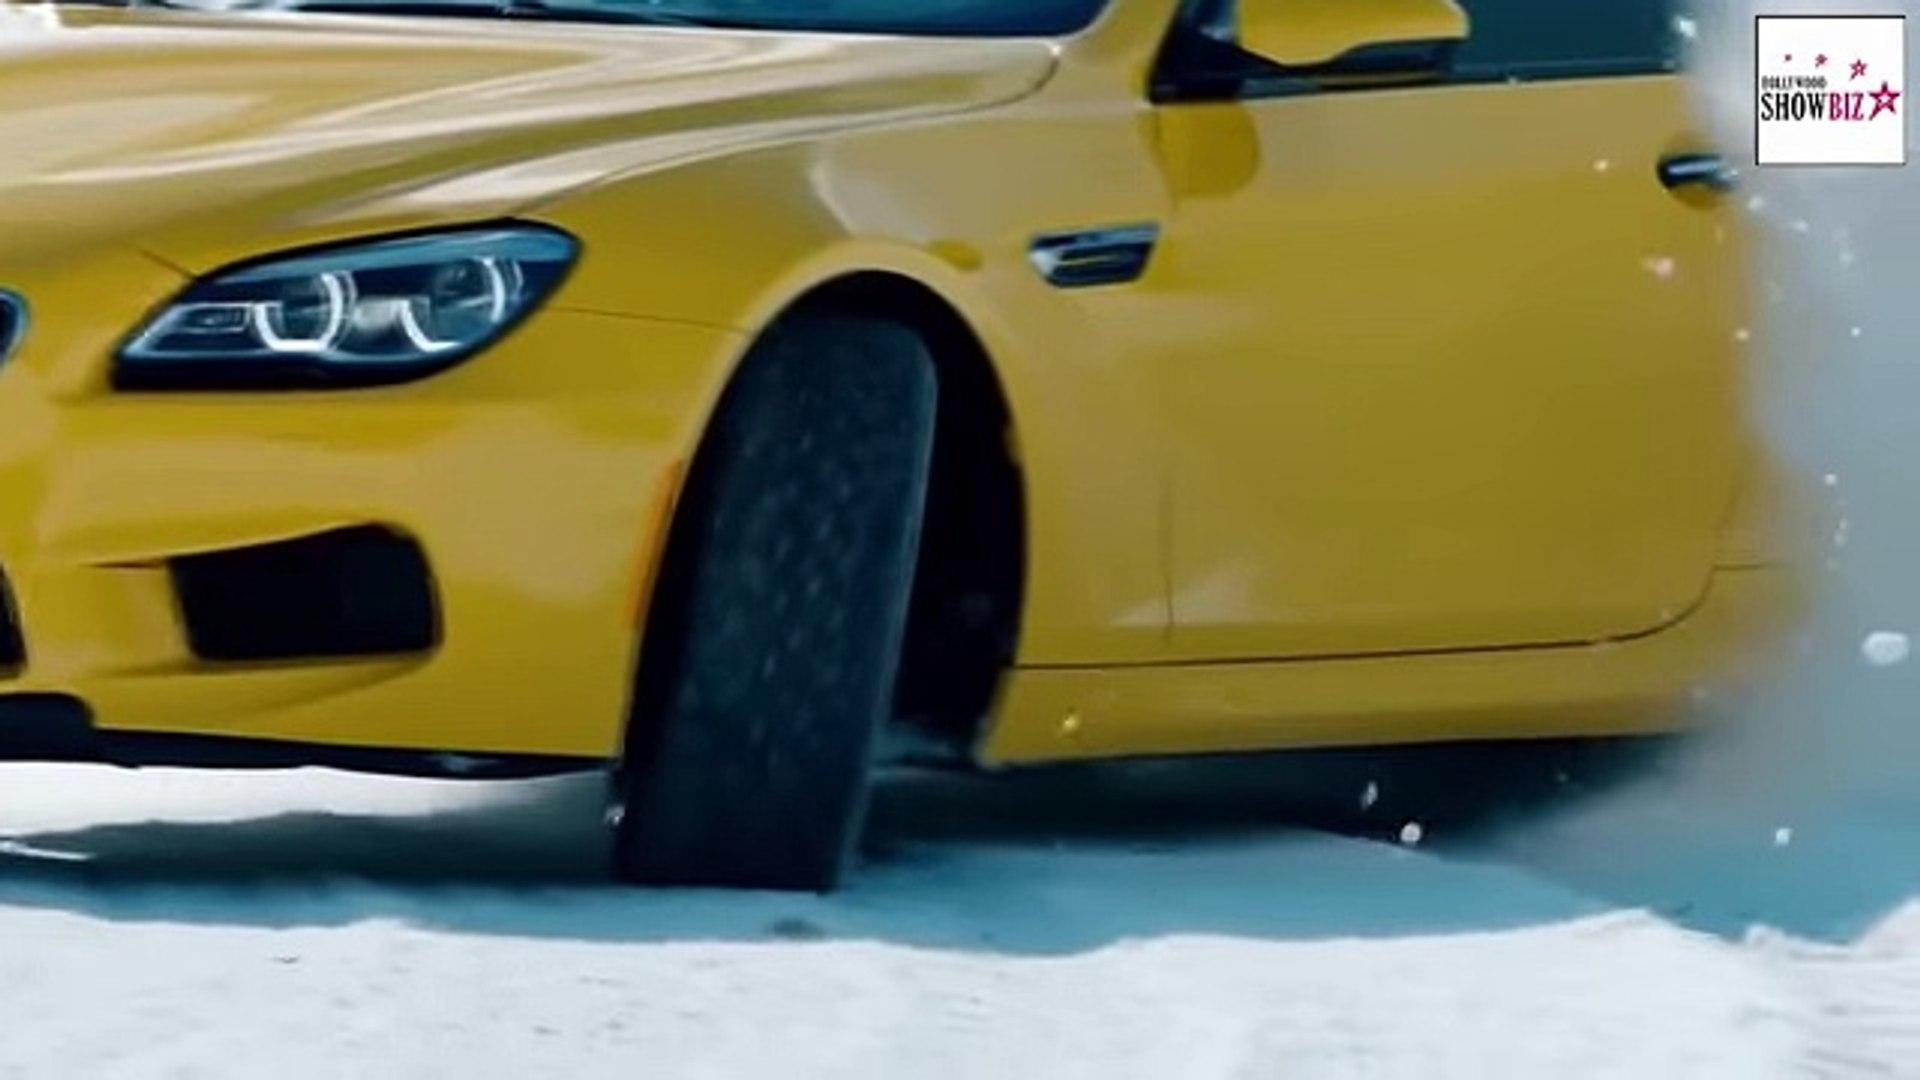 Drive Movie Trailer - Fan Made - Jacqueline Fernandez - Sushant Singh Rajput - Karan Johar Movie - U